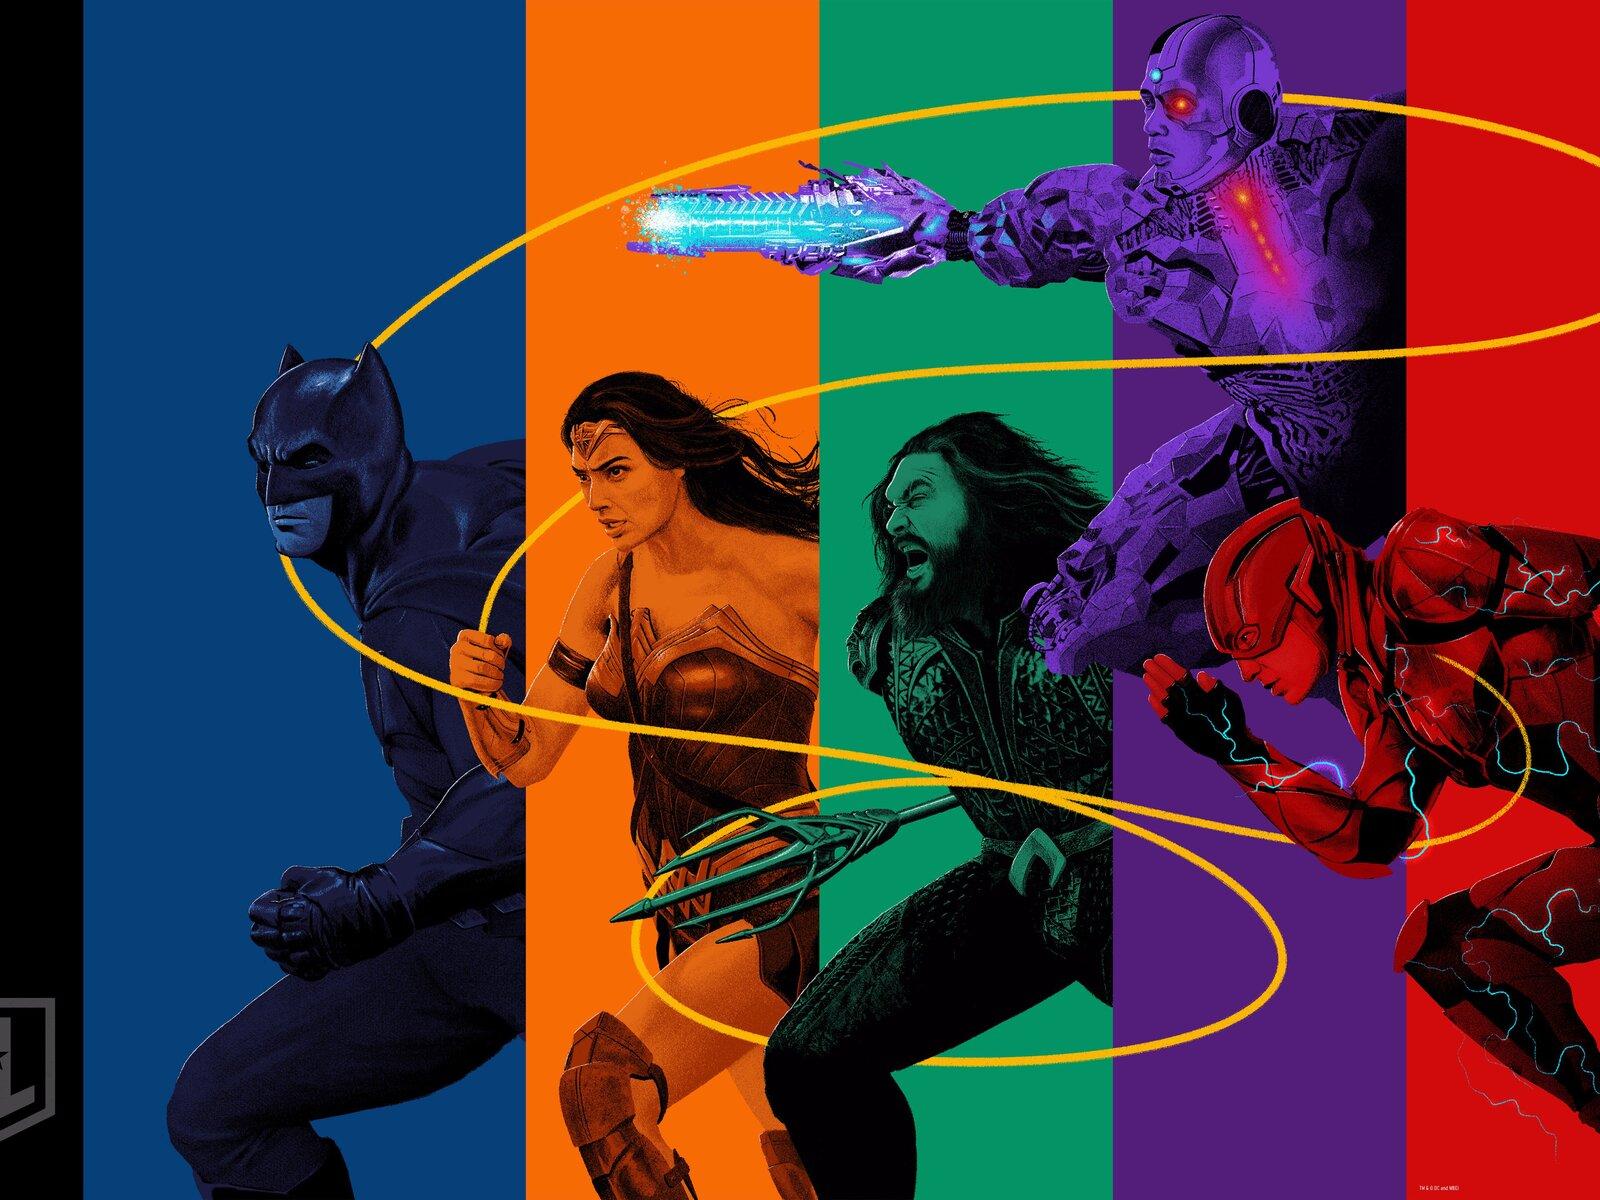 justice-league-2017-heroes-unite-4e.jpg